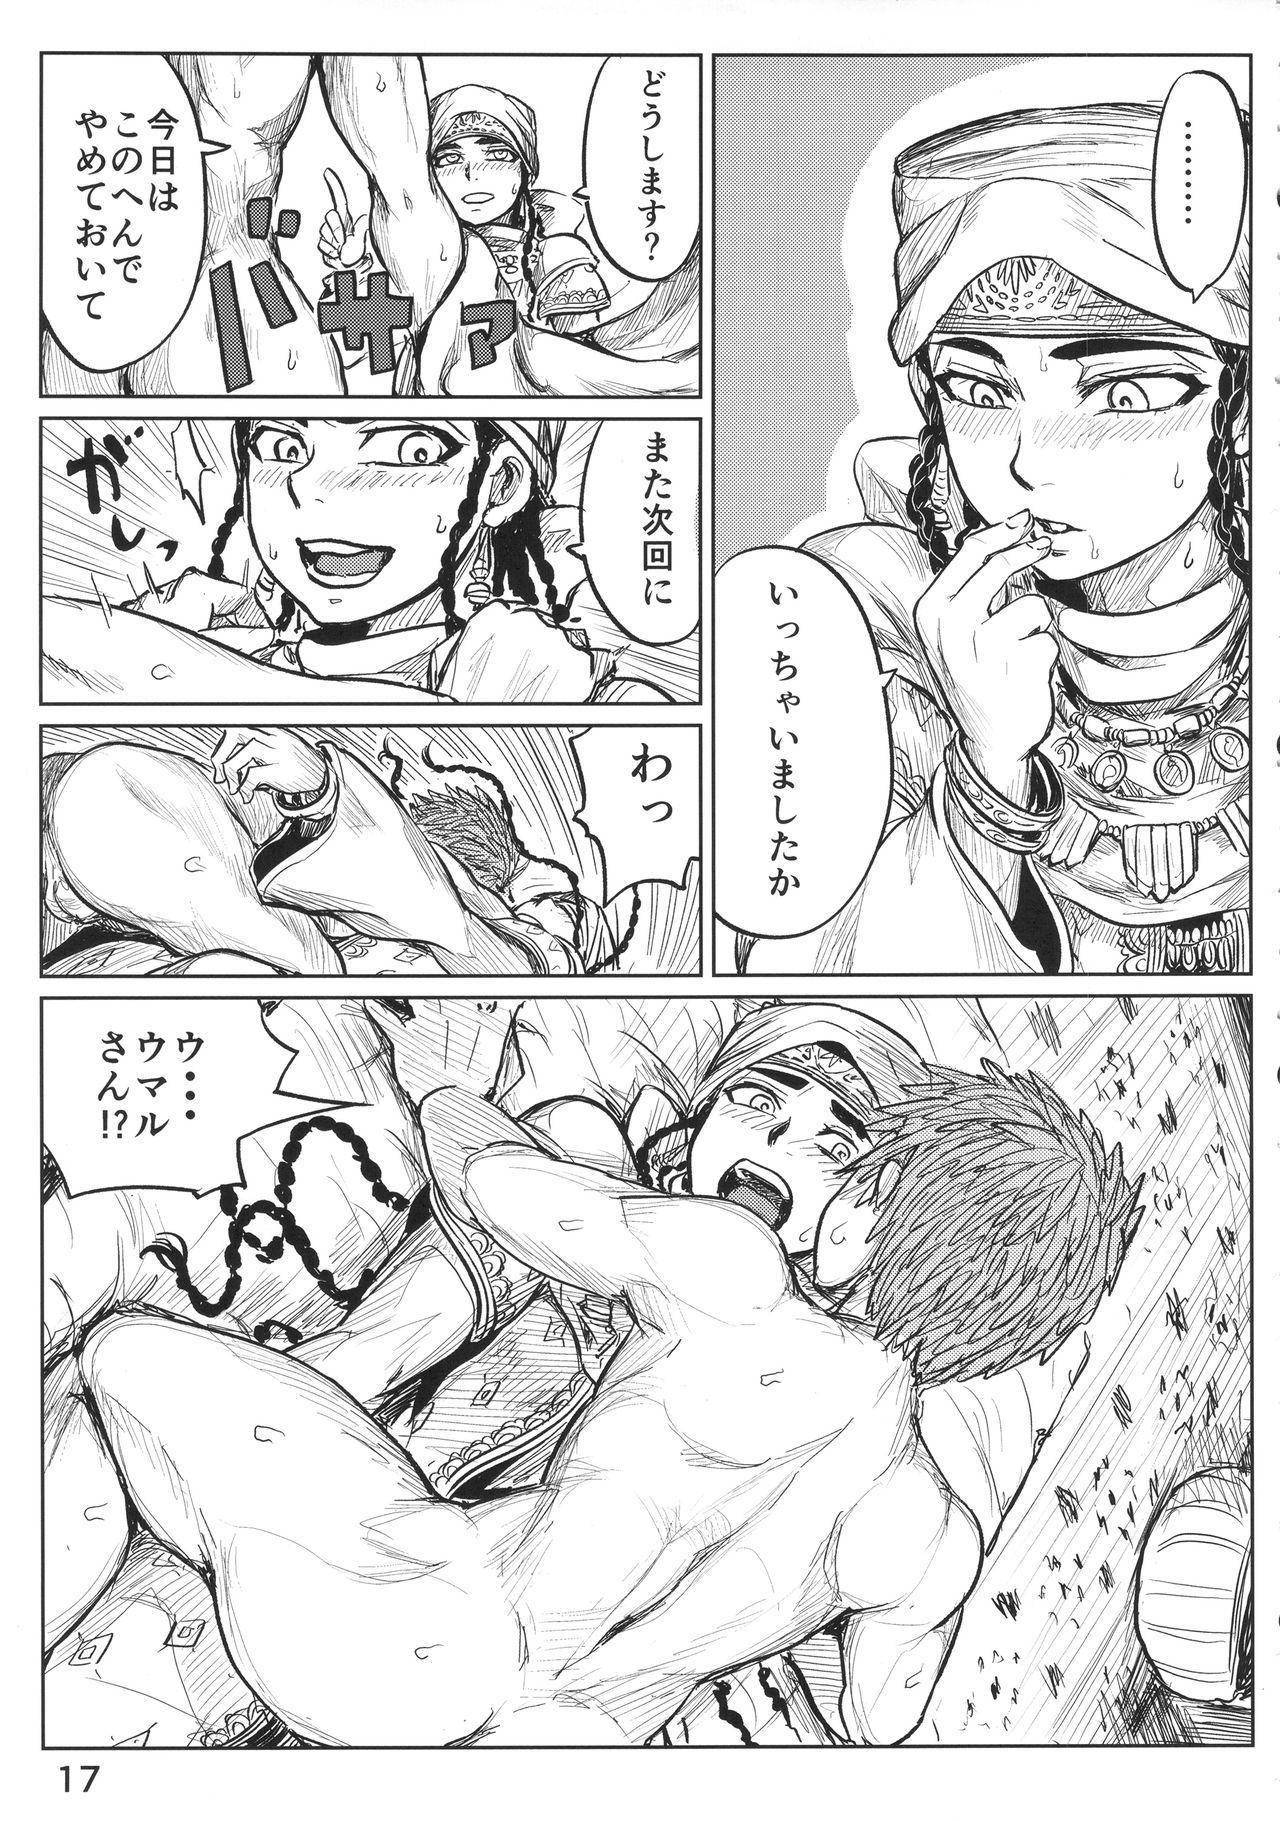 Yomedameshi 15